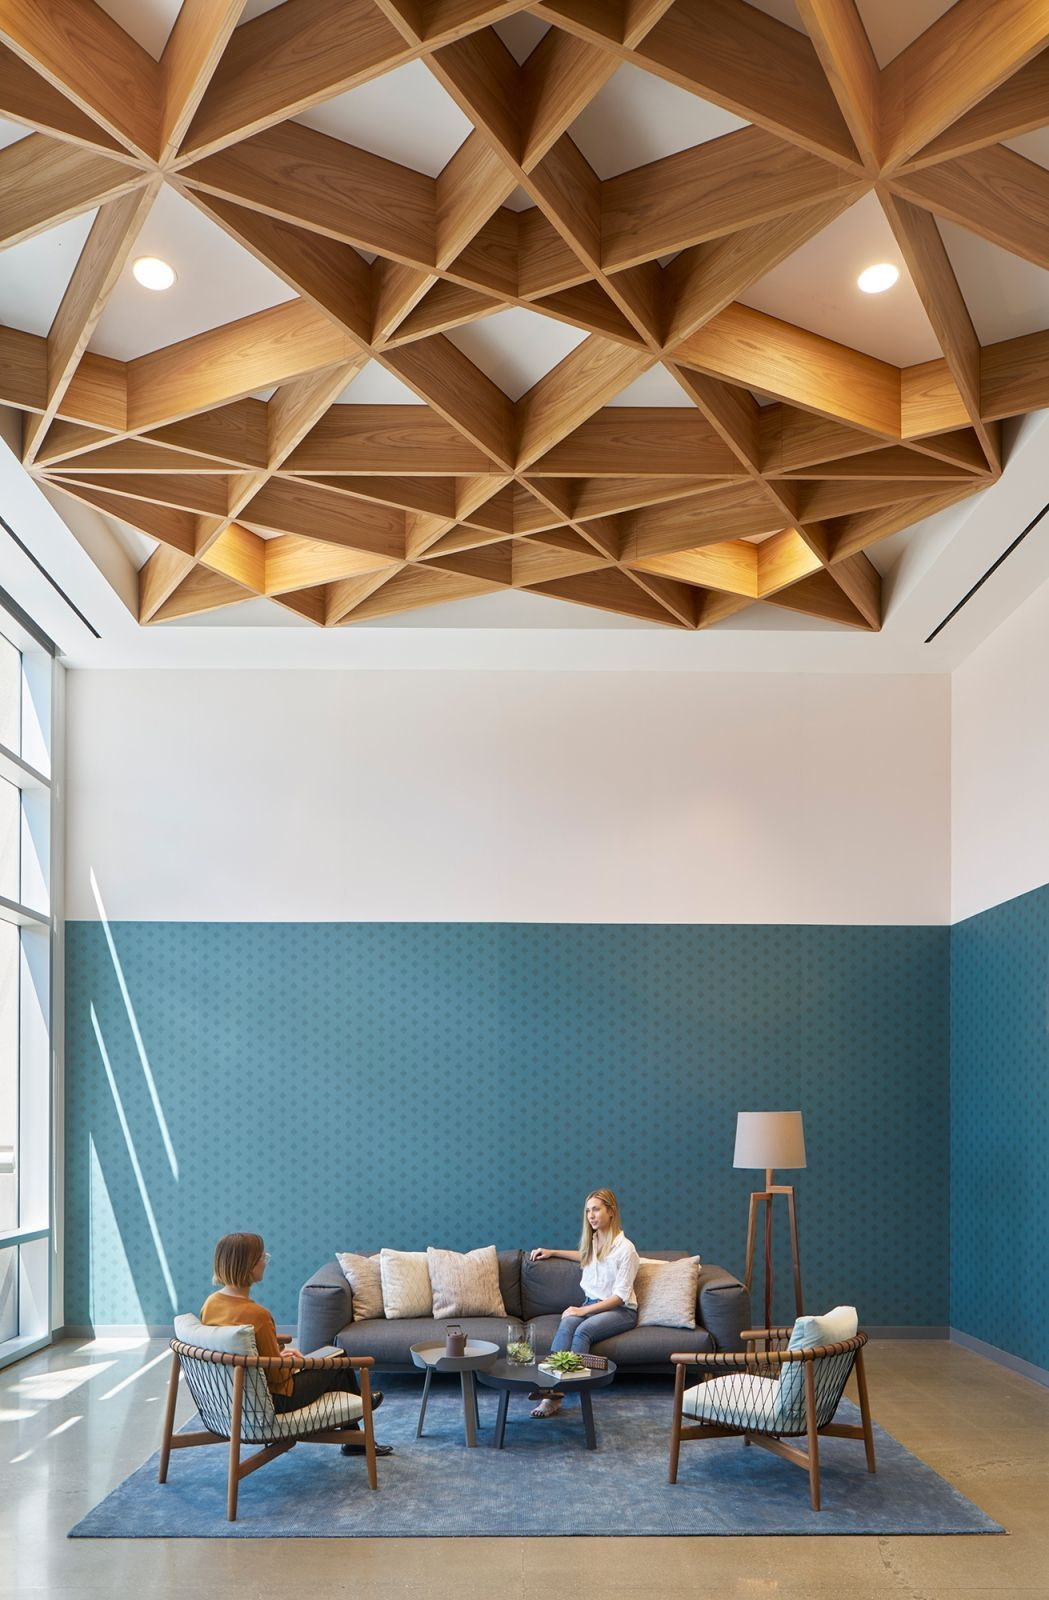 We Ve Seen Our Fair Allowance Of Creative Ceiling Design Ideas